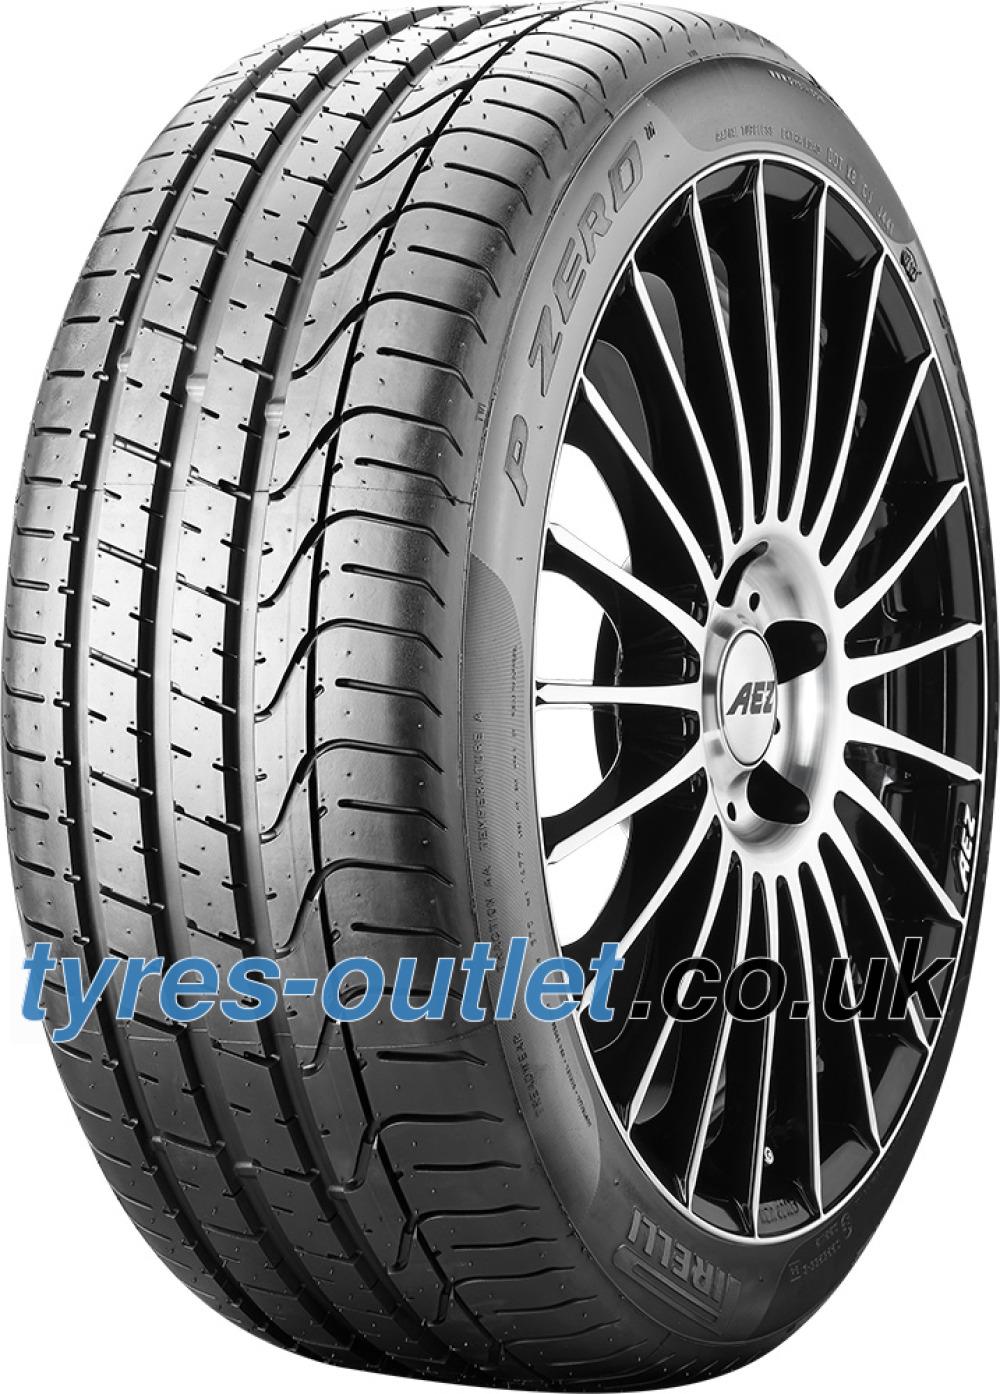 Pirelli P Zero ( 285/40 ZR22 110Y XL MO1 )